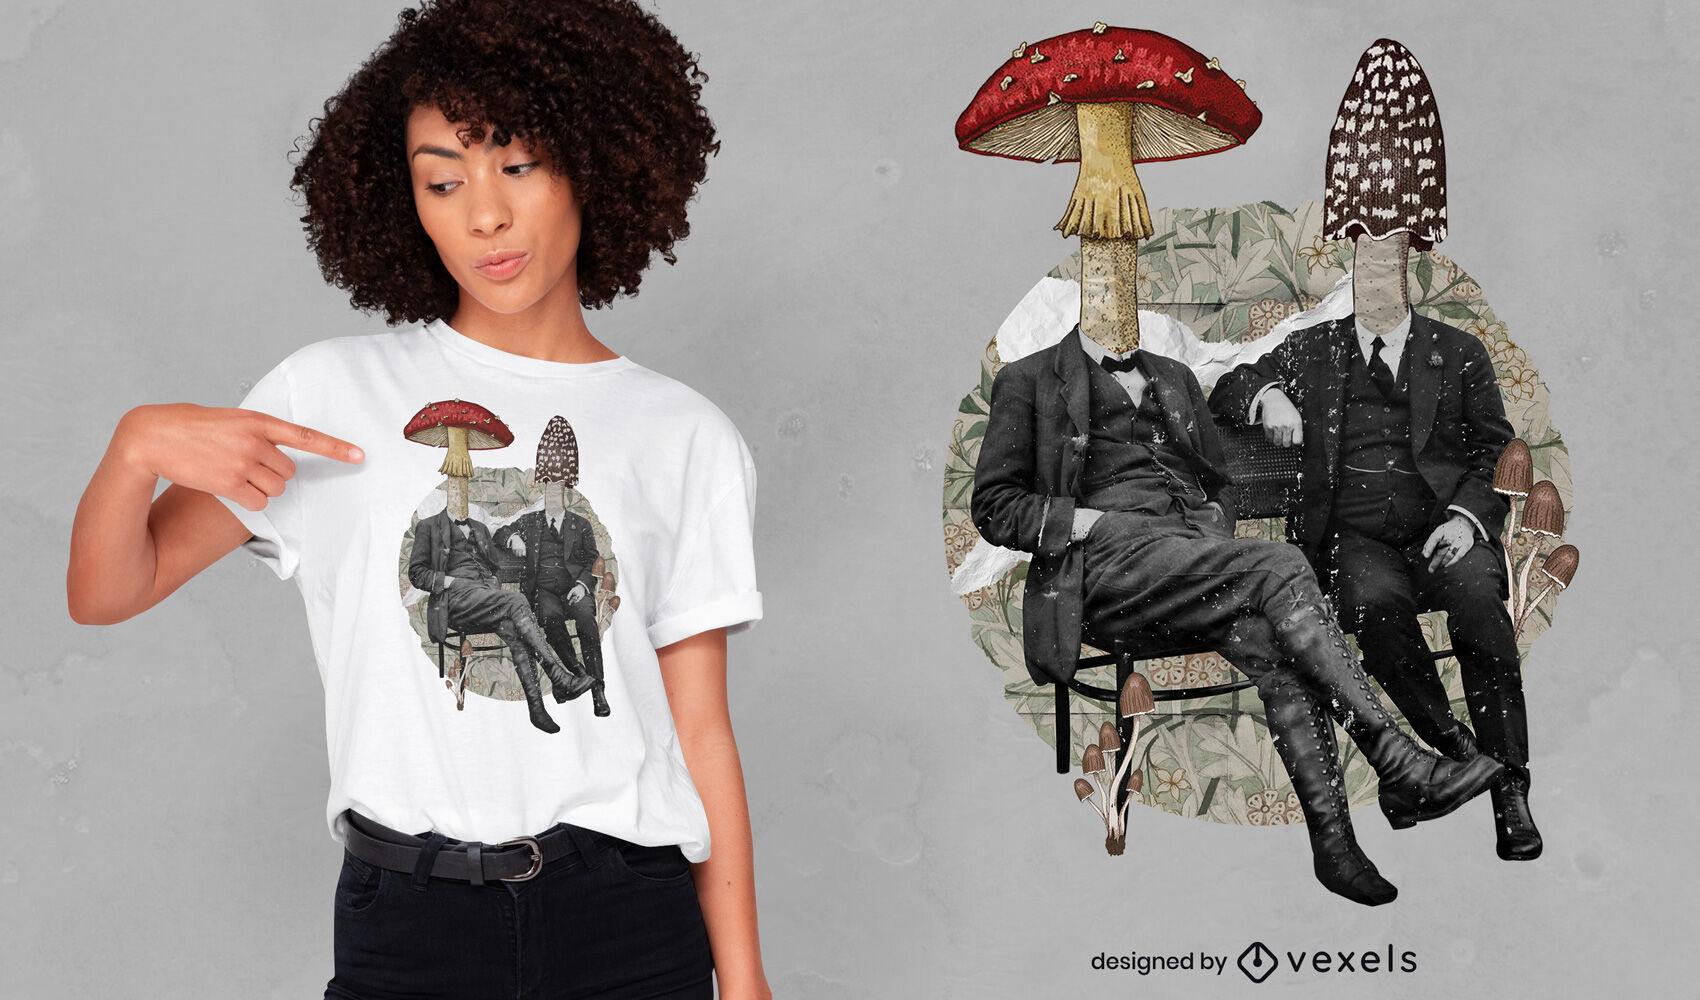 Diseño de camiseta psd de collage de personas de hongos